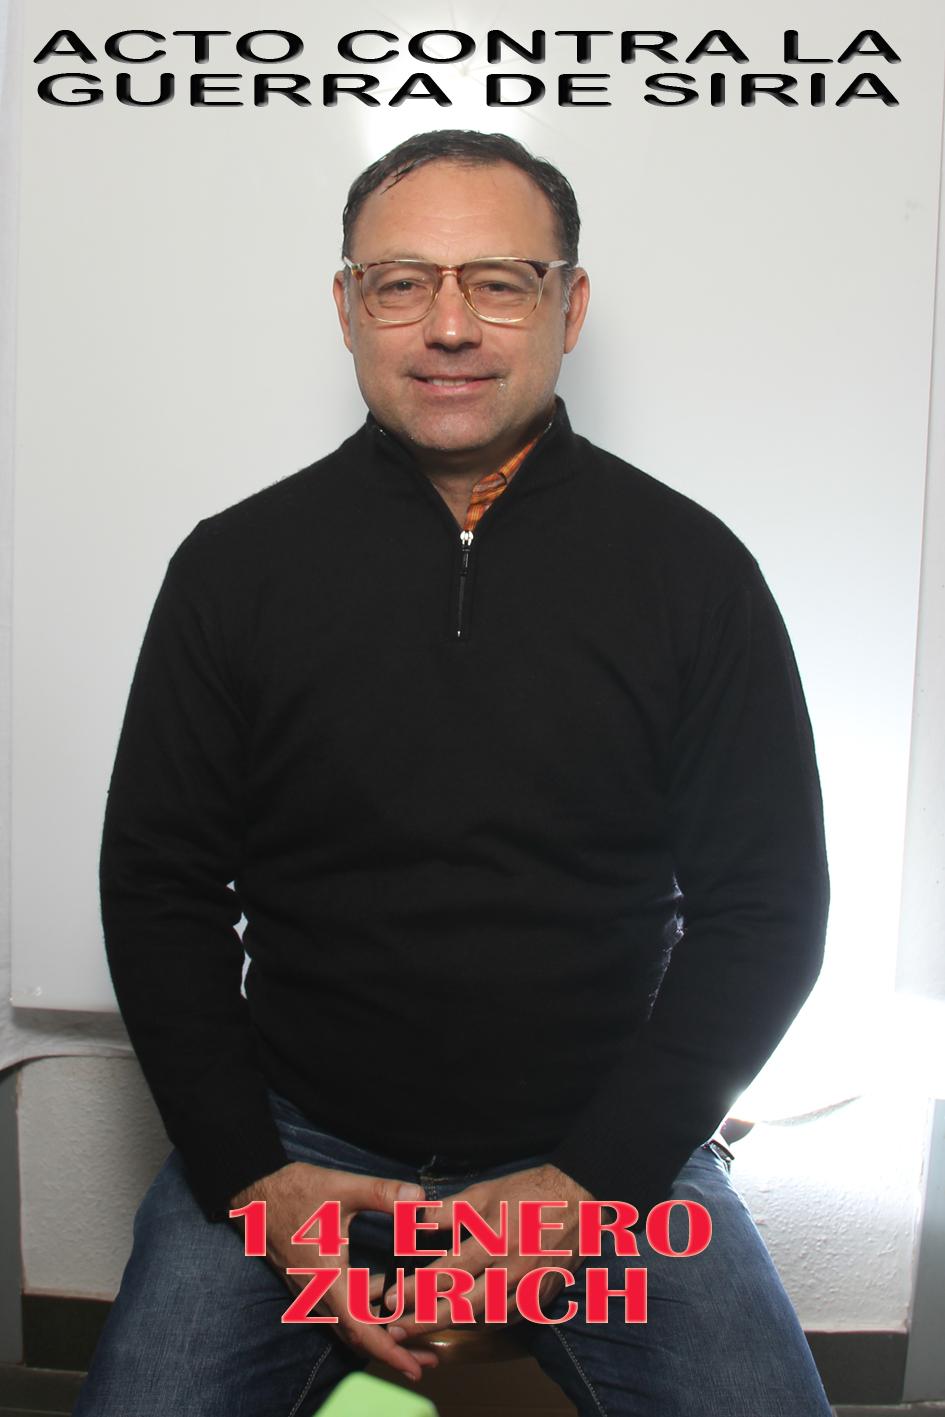 Jesús Antonio Fernández Olmedo